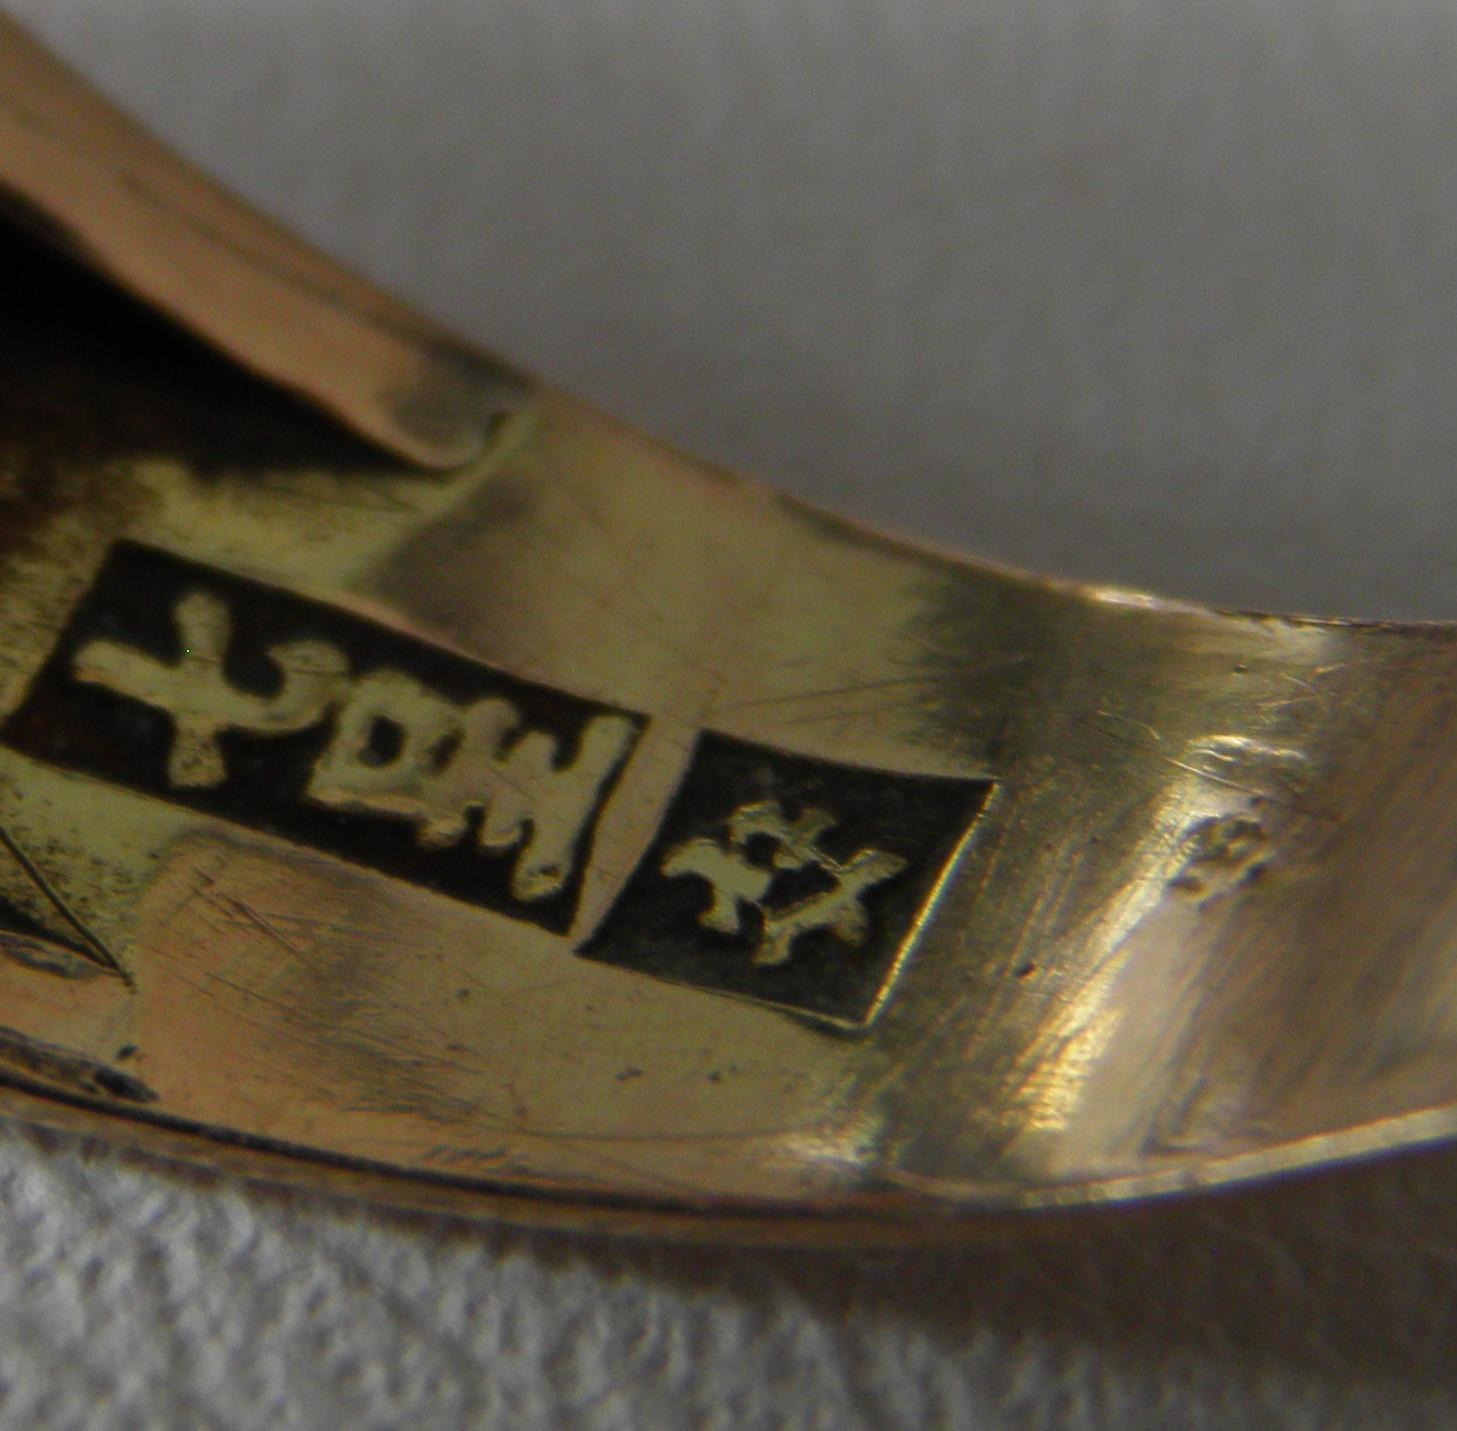 Chinese Gold Hallmark The Ebay Community